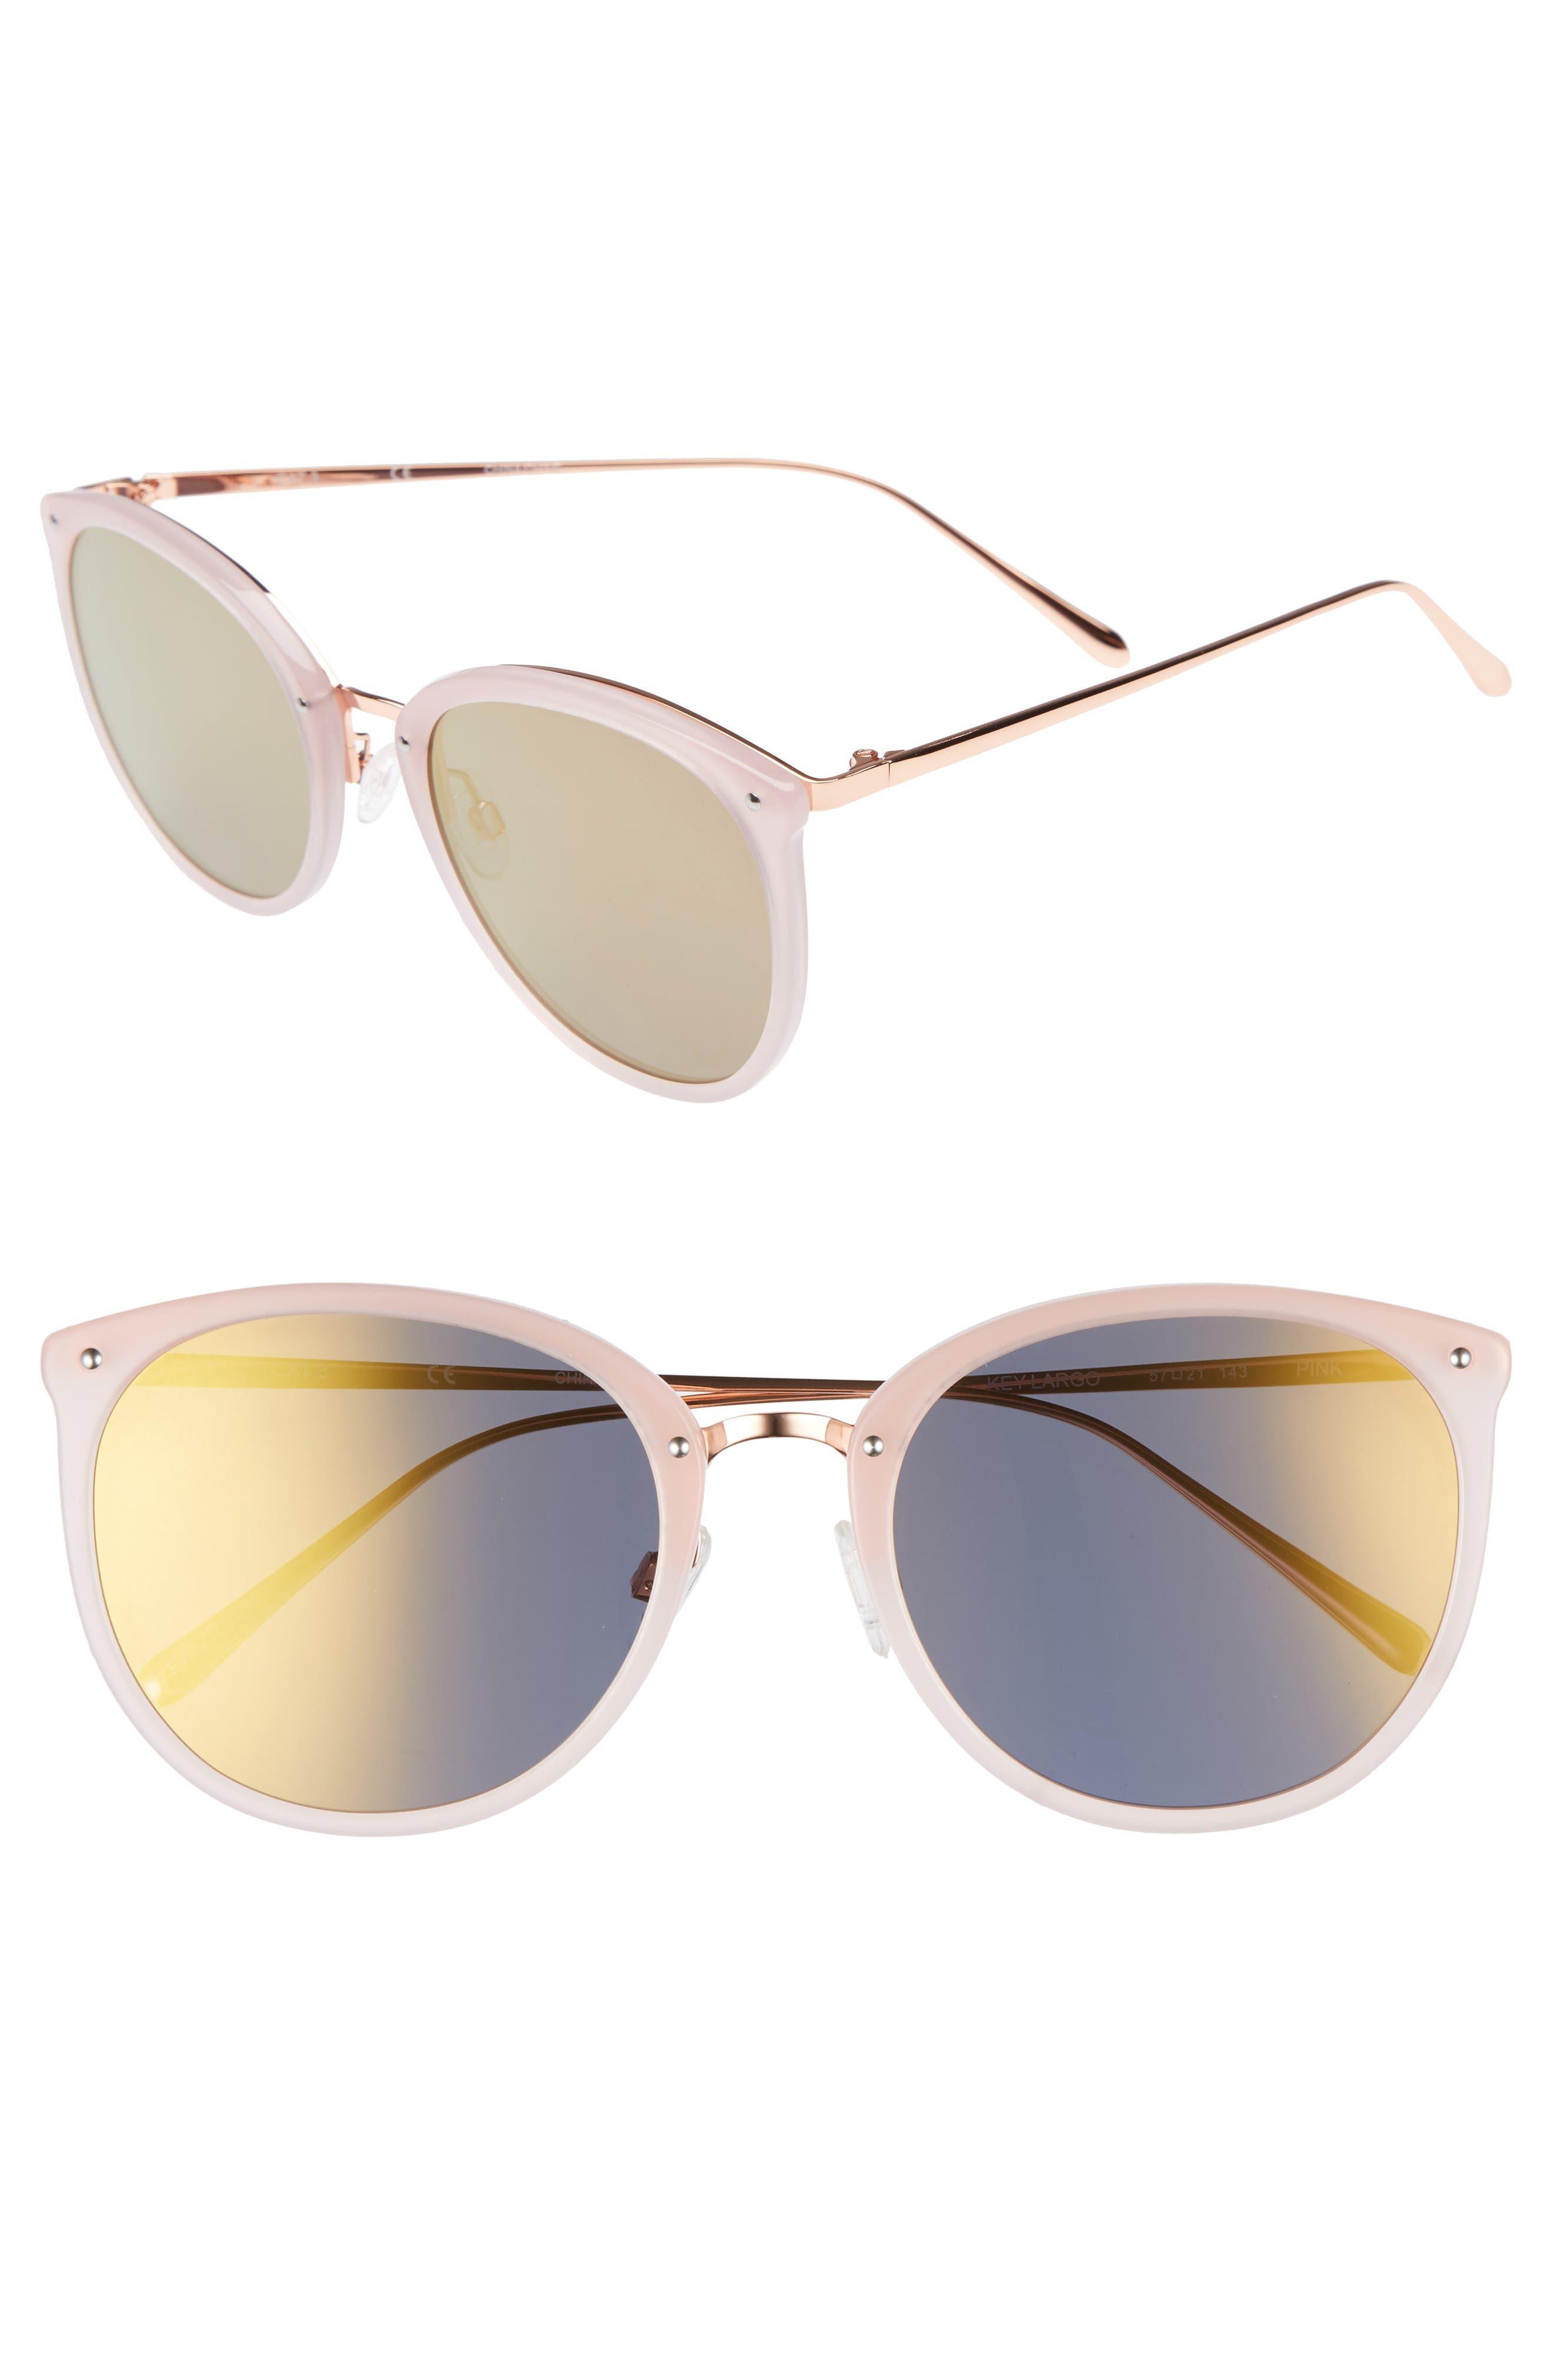 Key Largo 57mm Sunglasses,                             Main thumbnail 1, color,                             Milky Pink